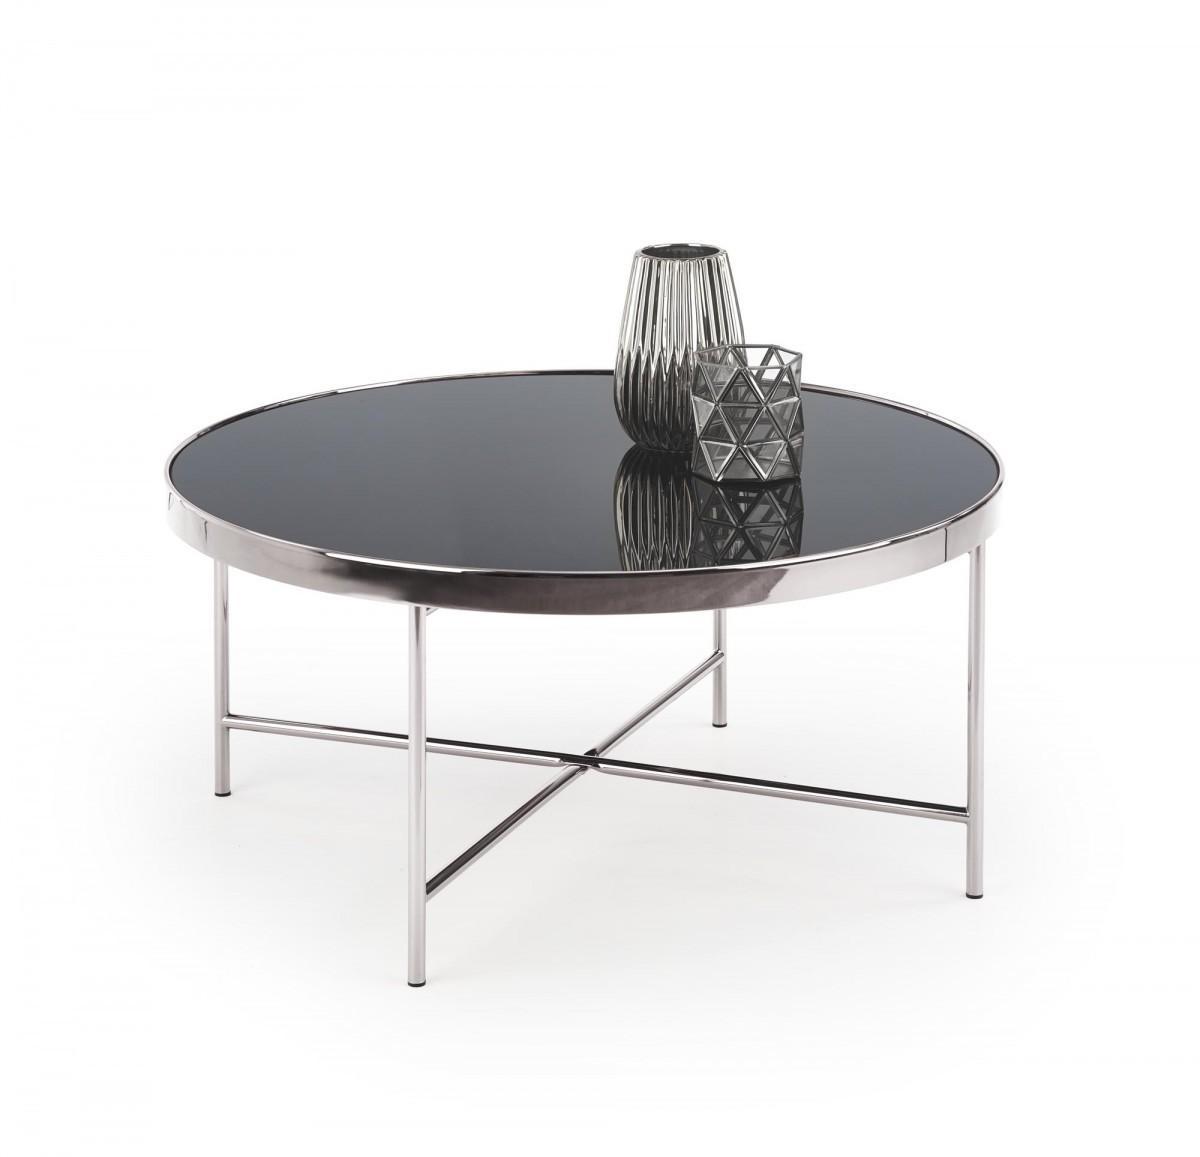 Konferenční stolek Moria chrom/černý